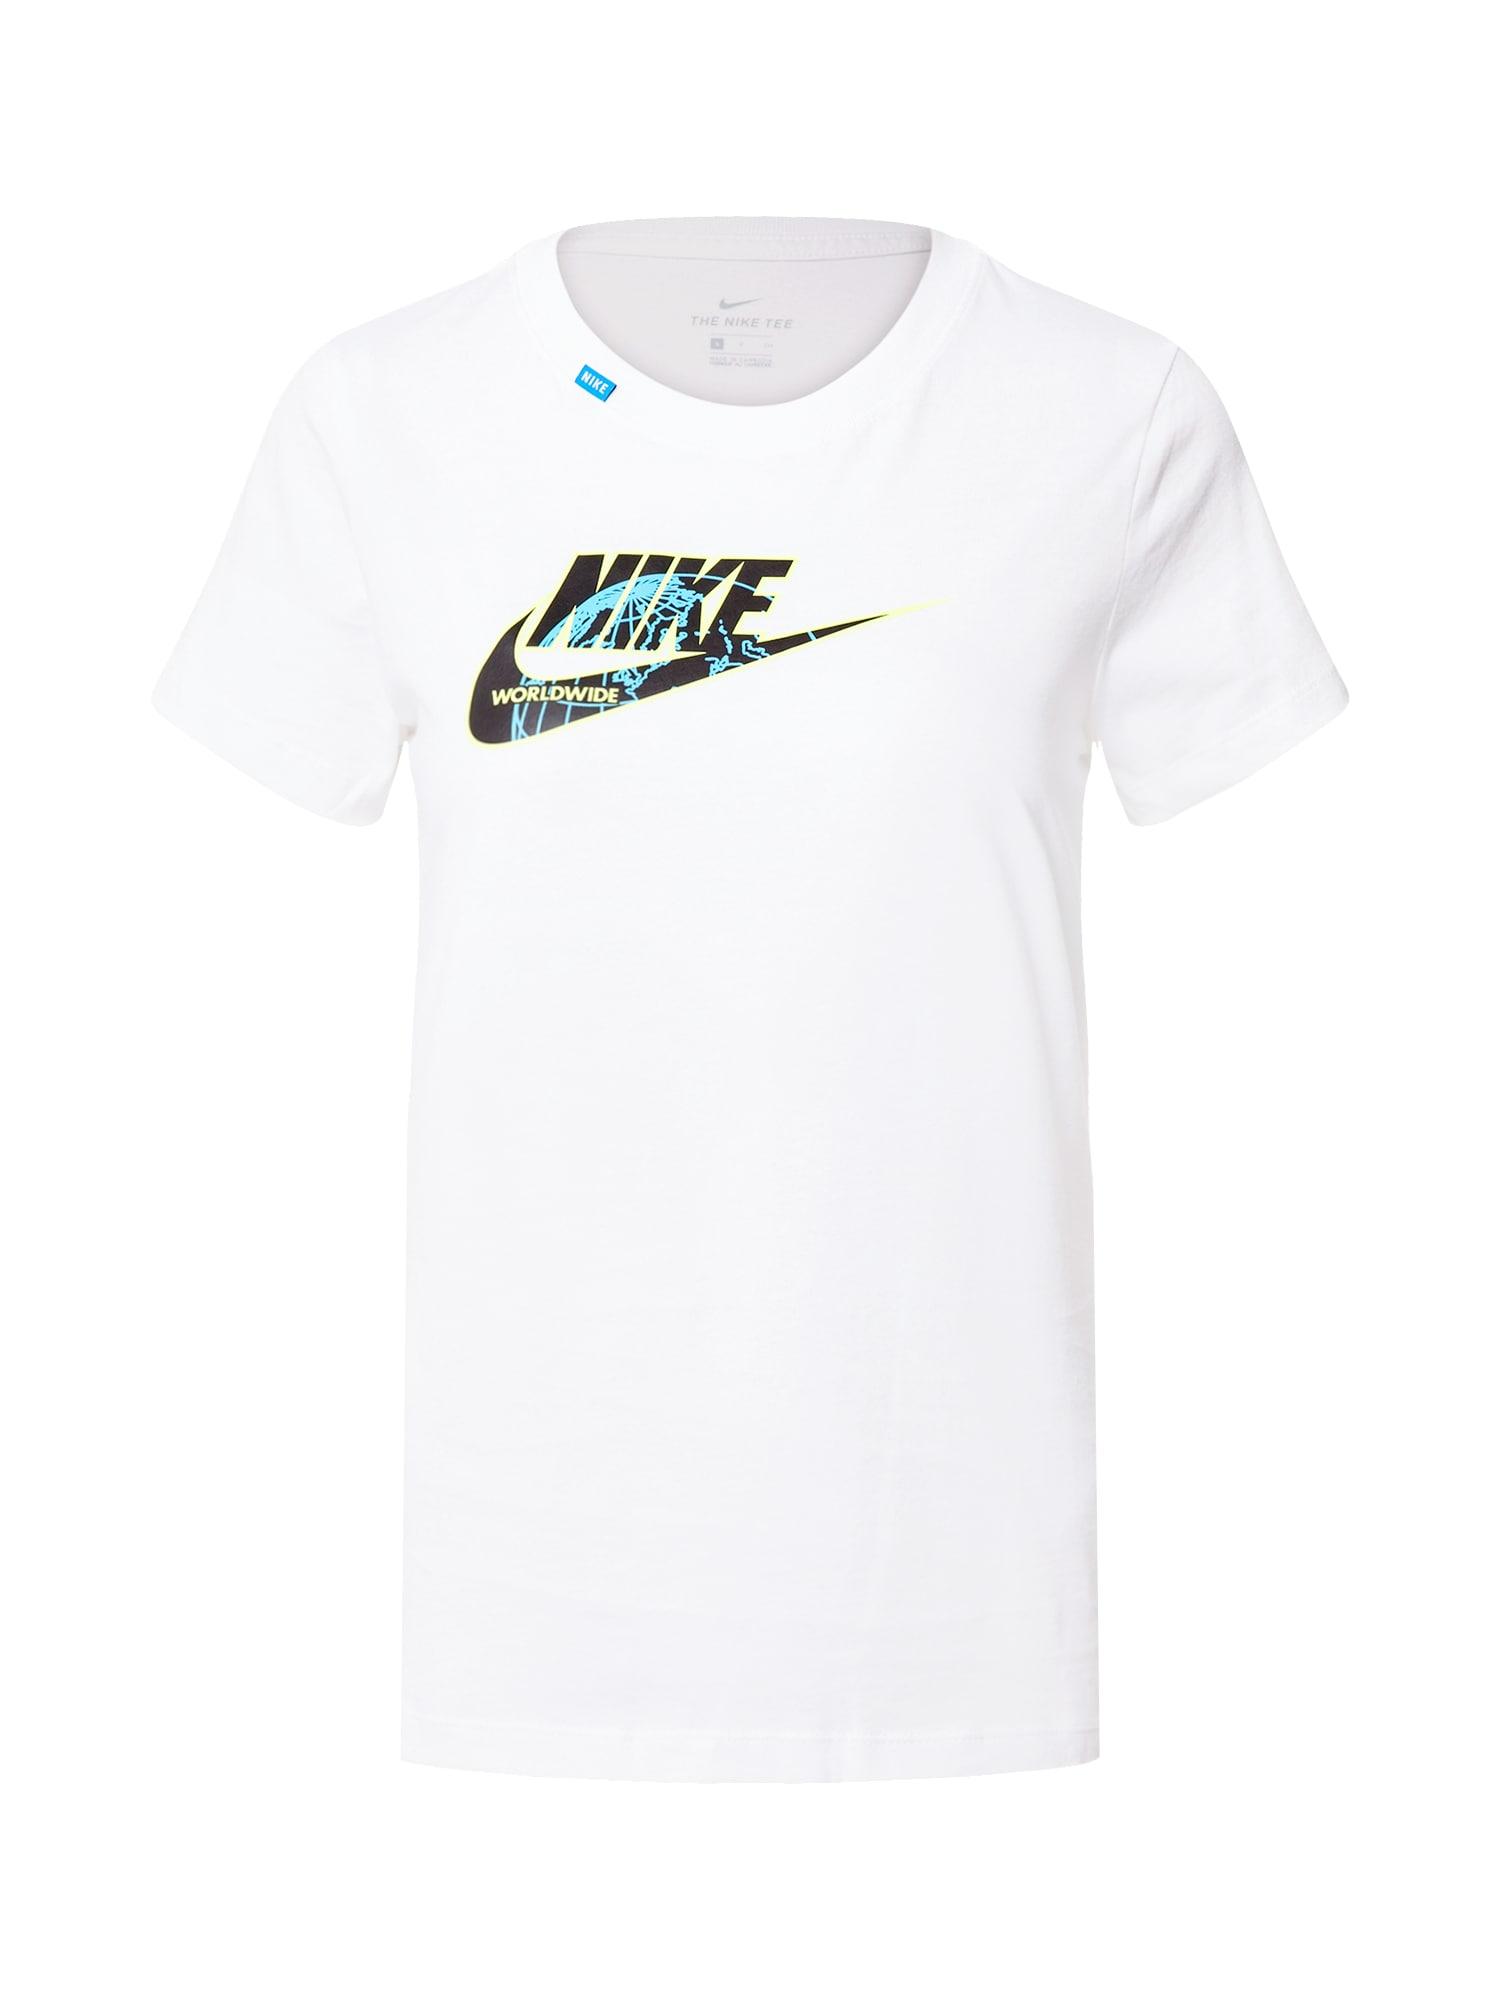 Nike Sportswear Marškinėliai 'Worldwide 1' balta / juoda